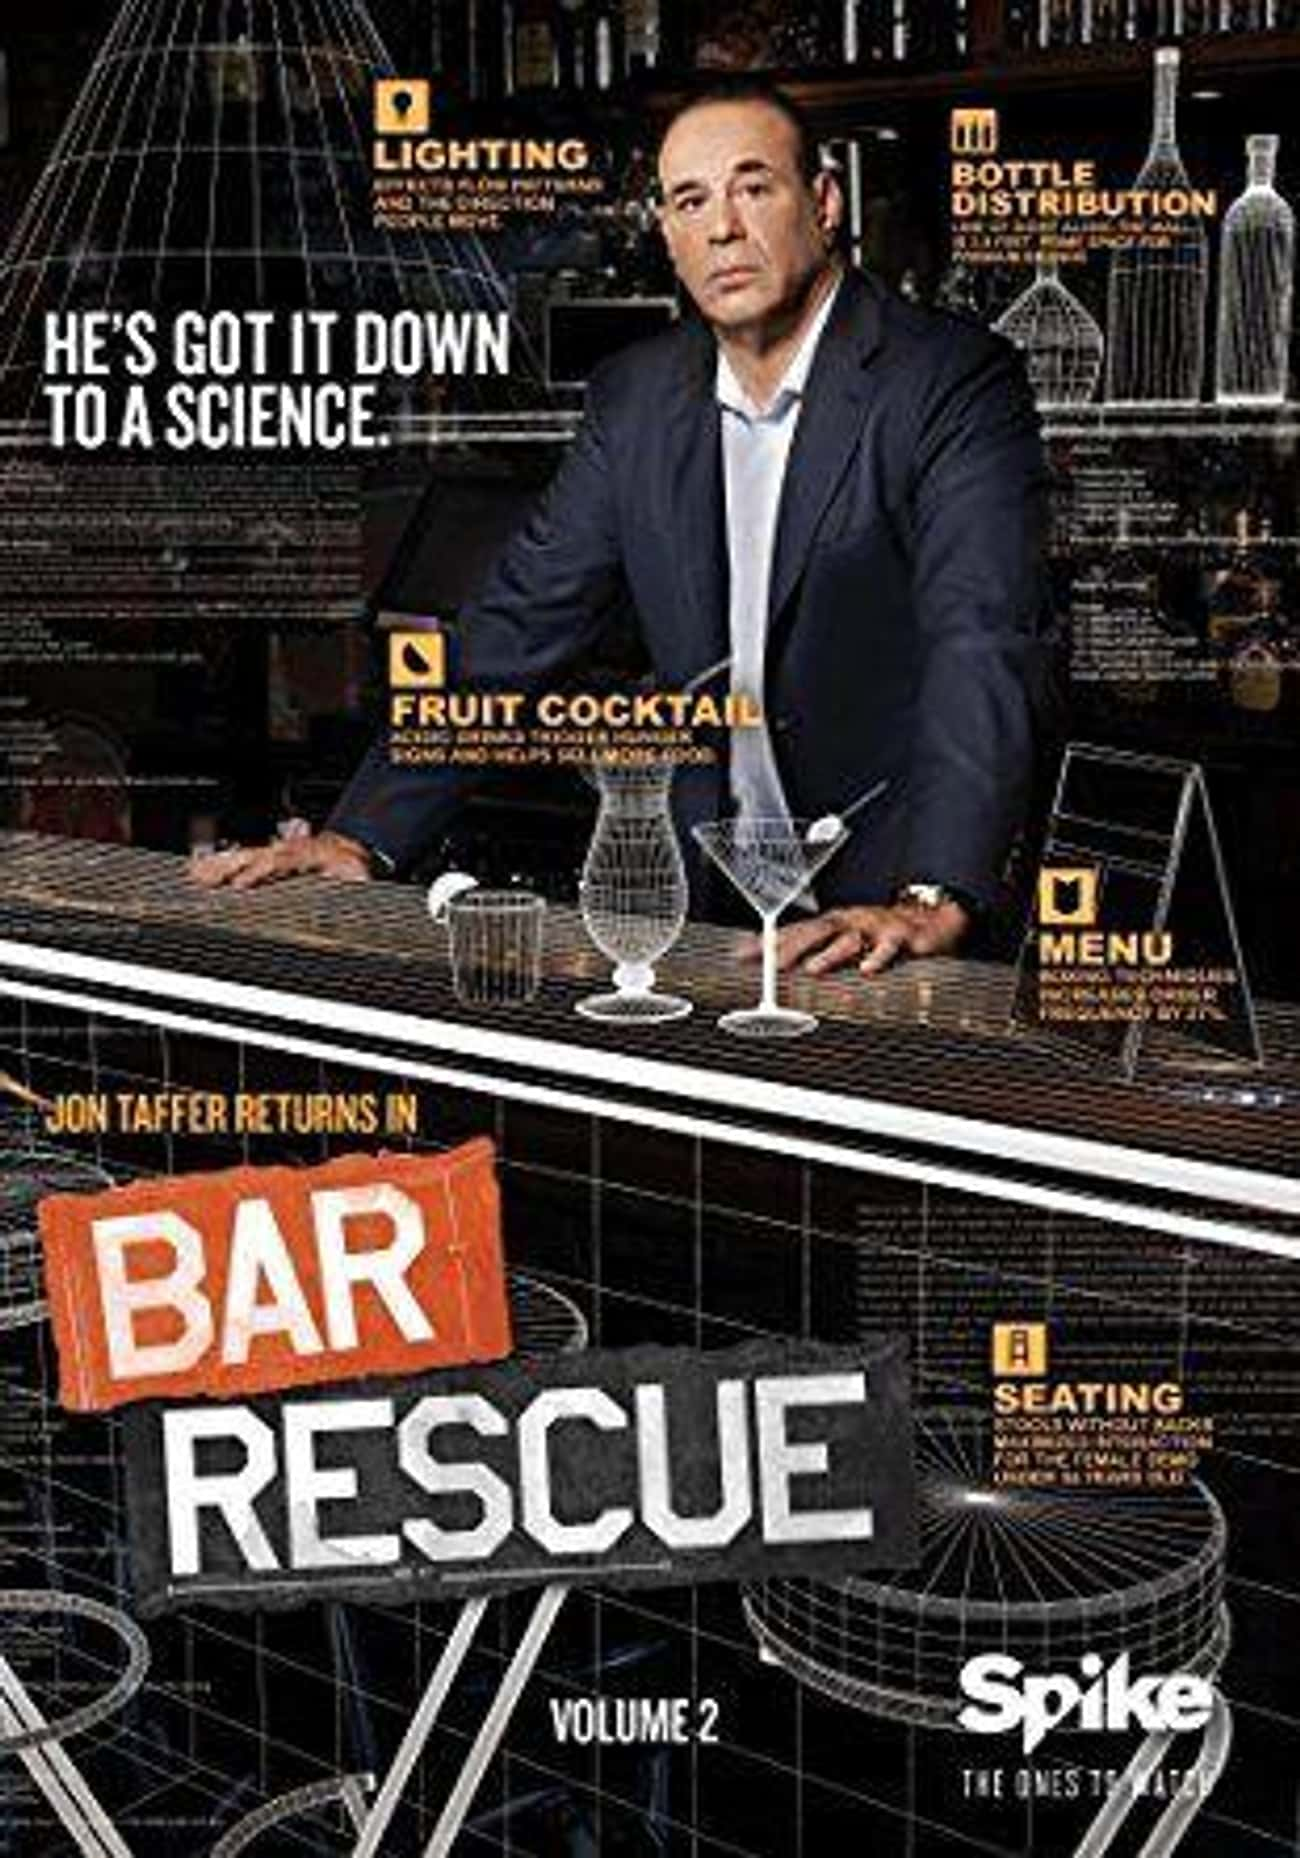 Bar Rescue Season 2